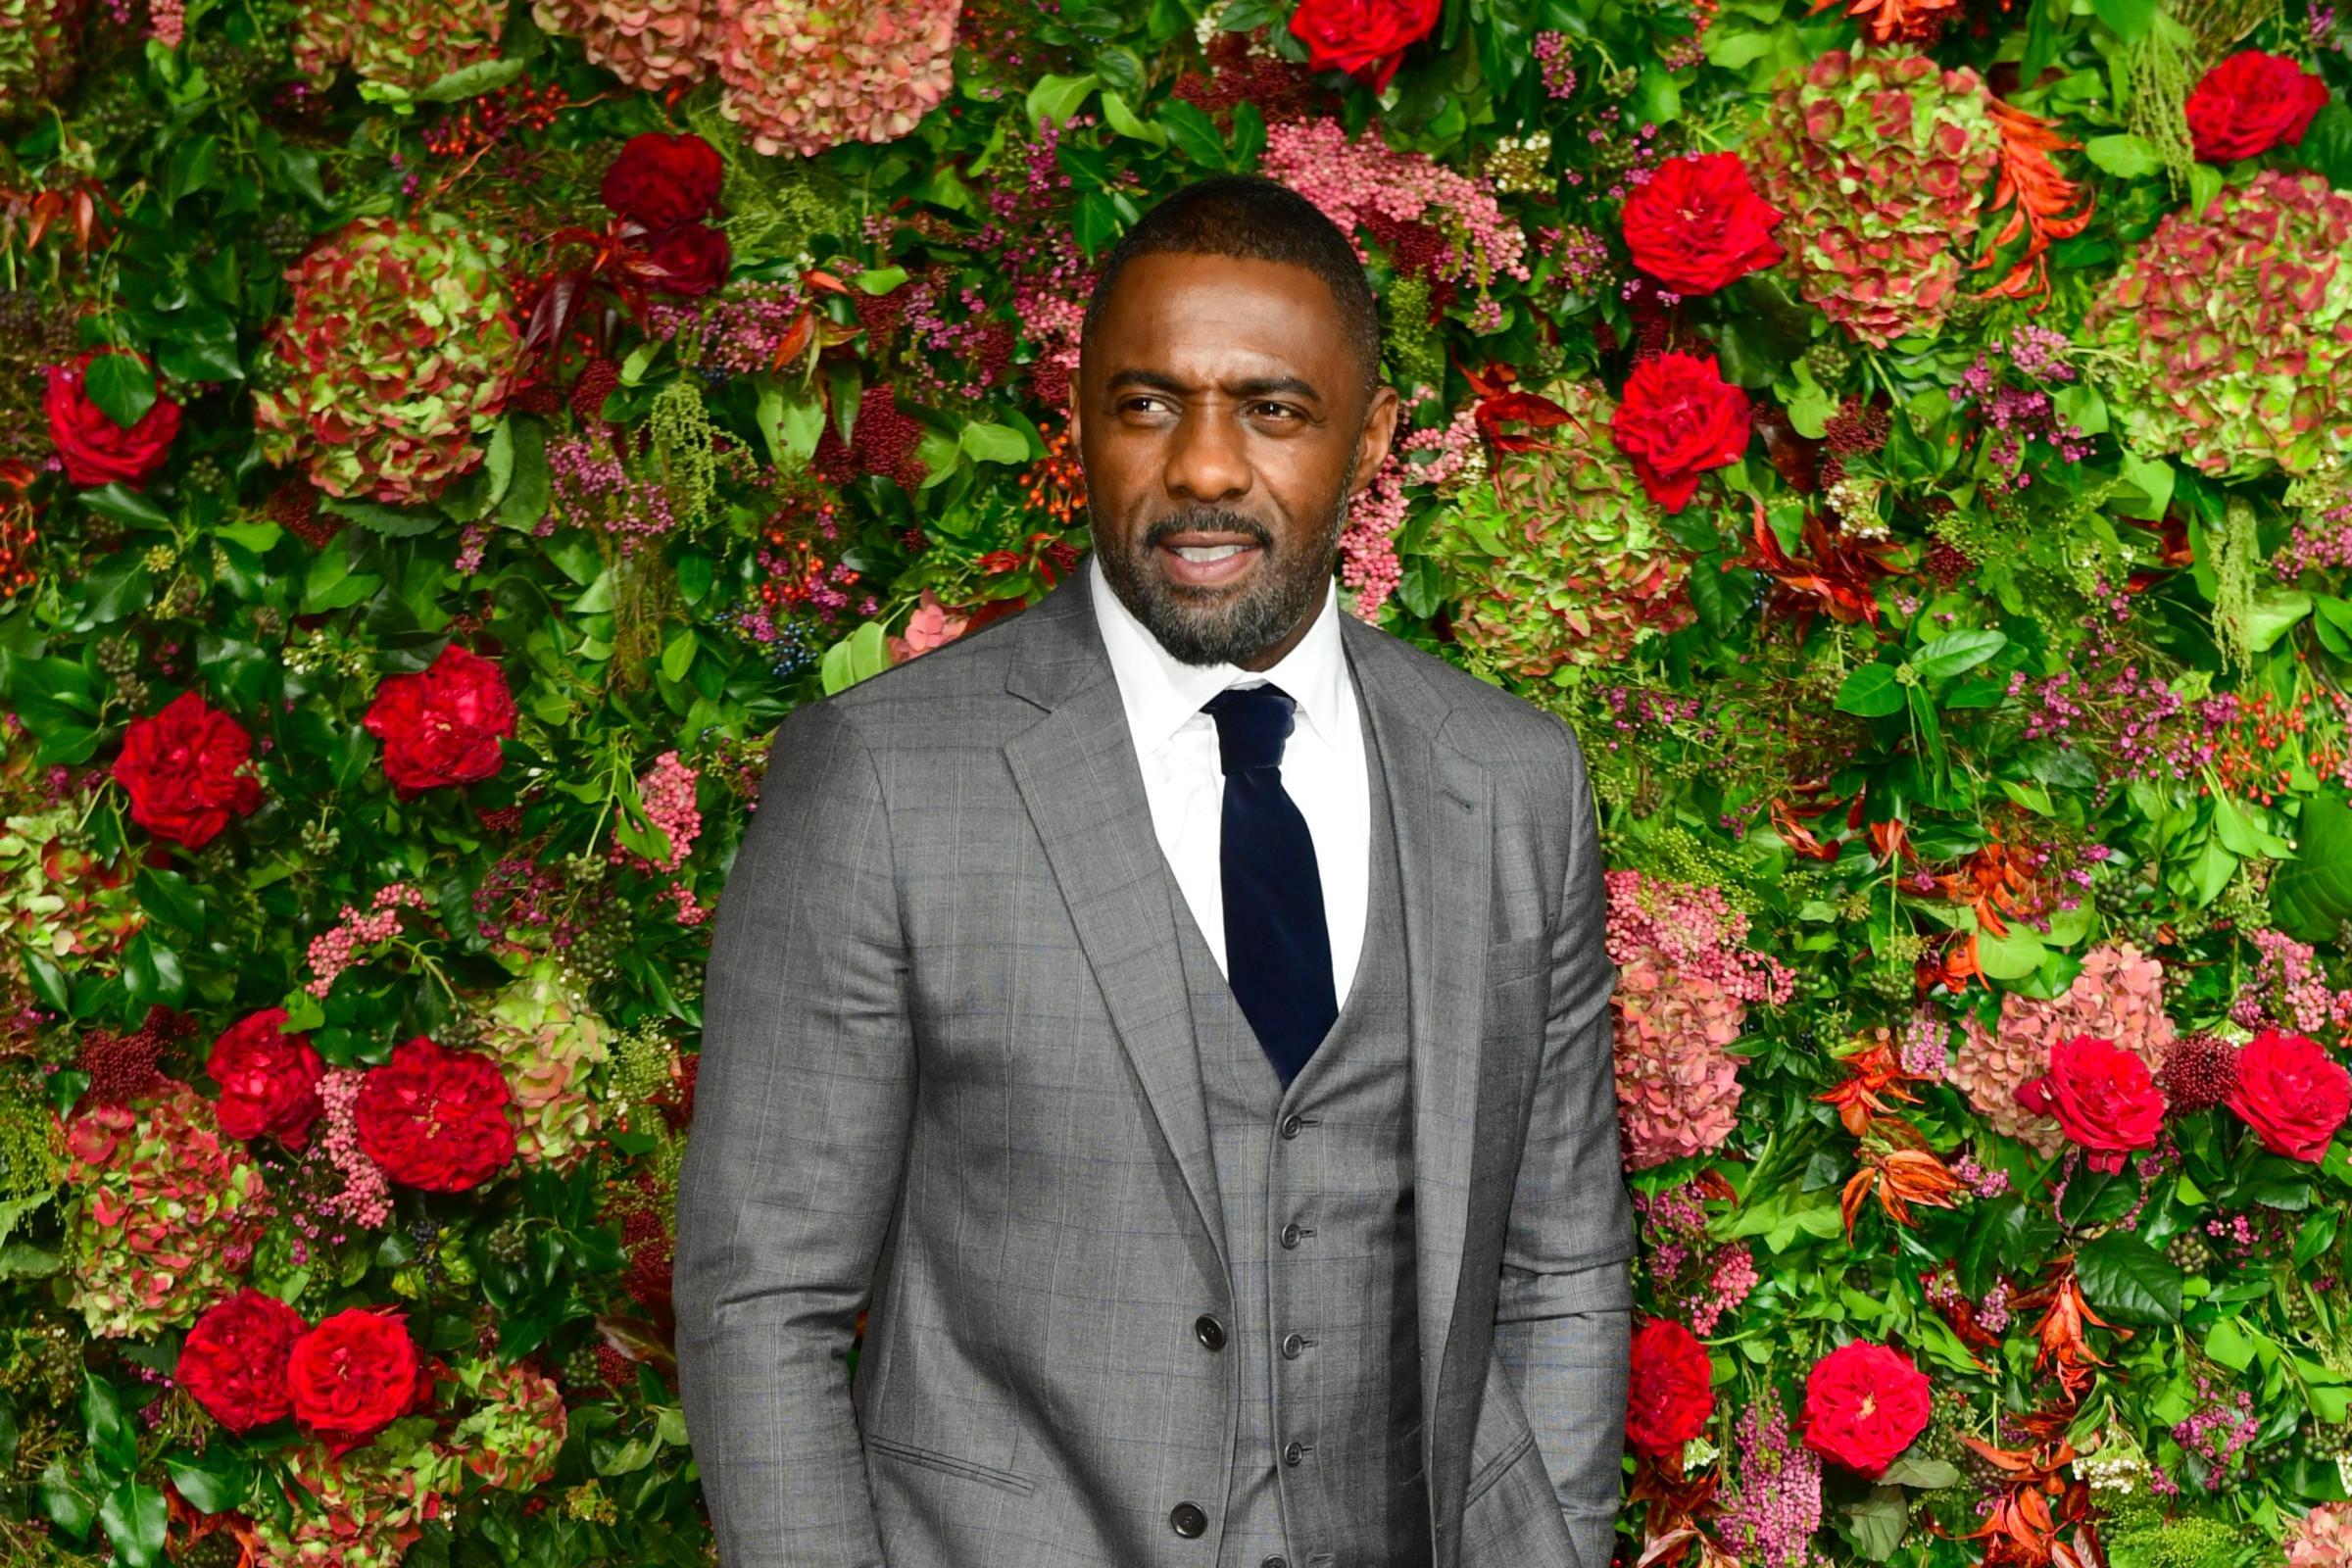 Idris Elba to star in all-black Western - Dudley News